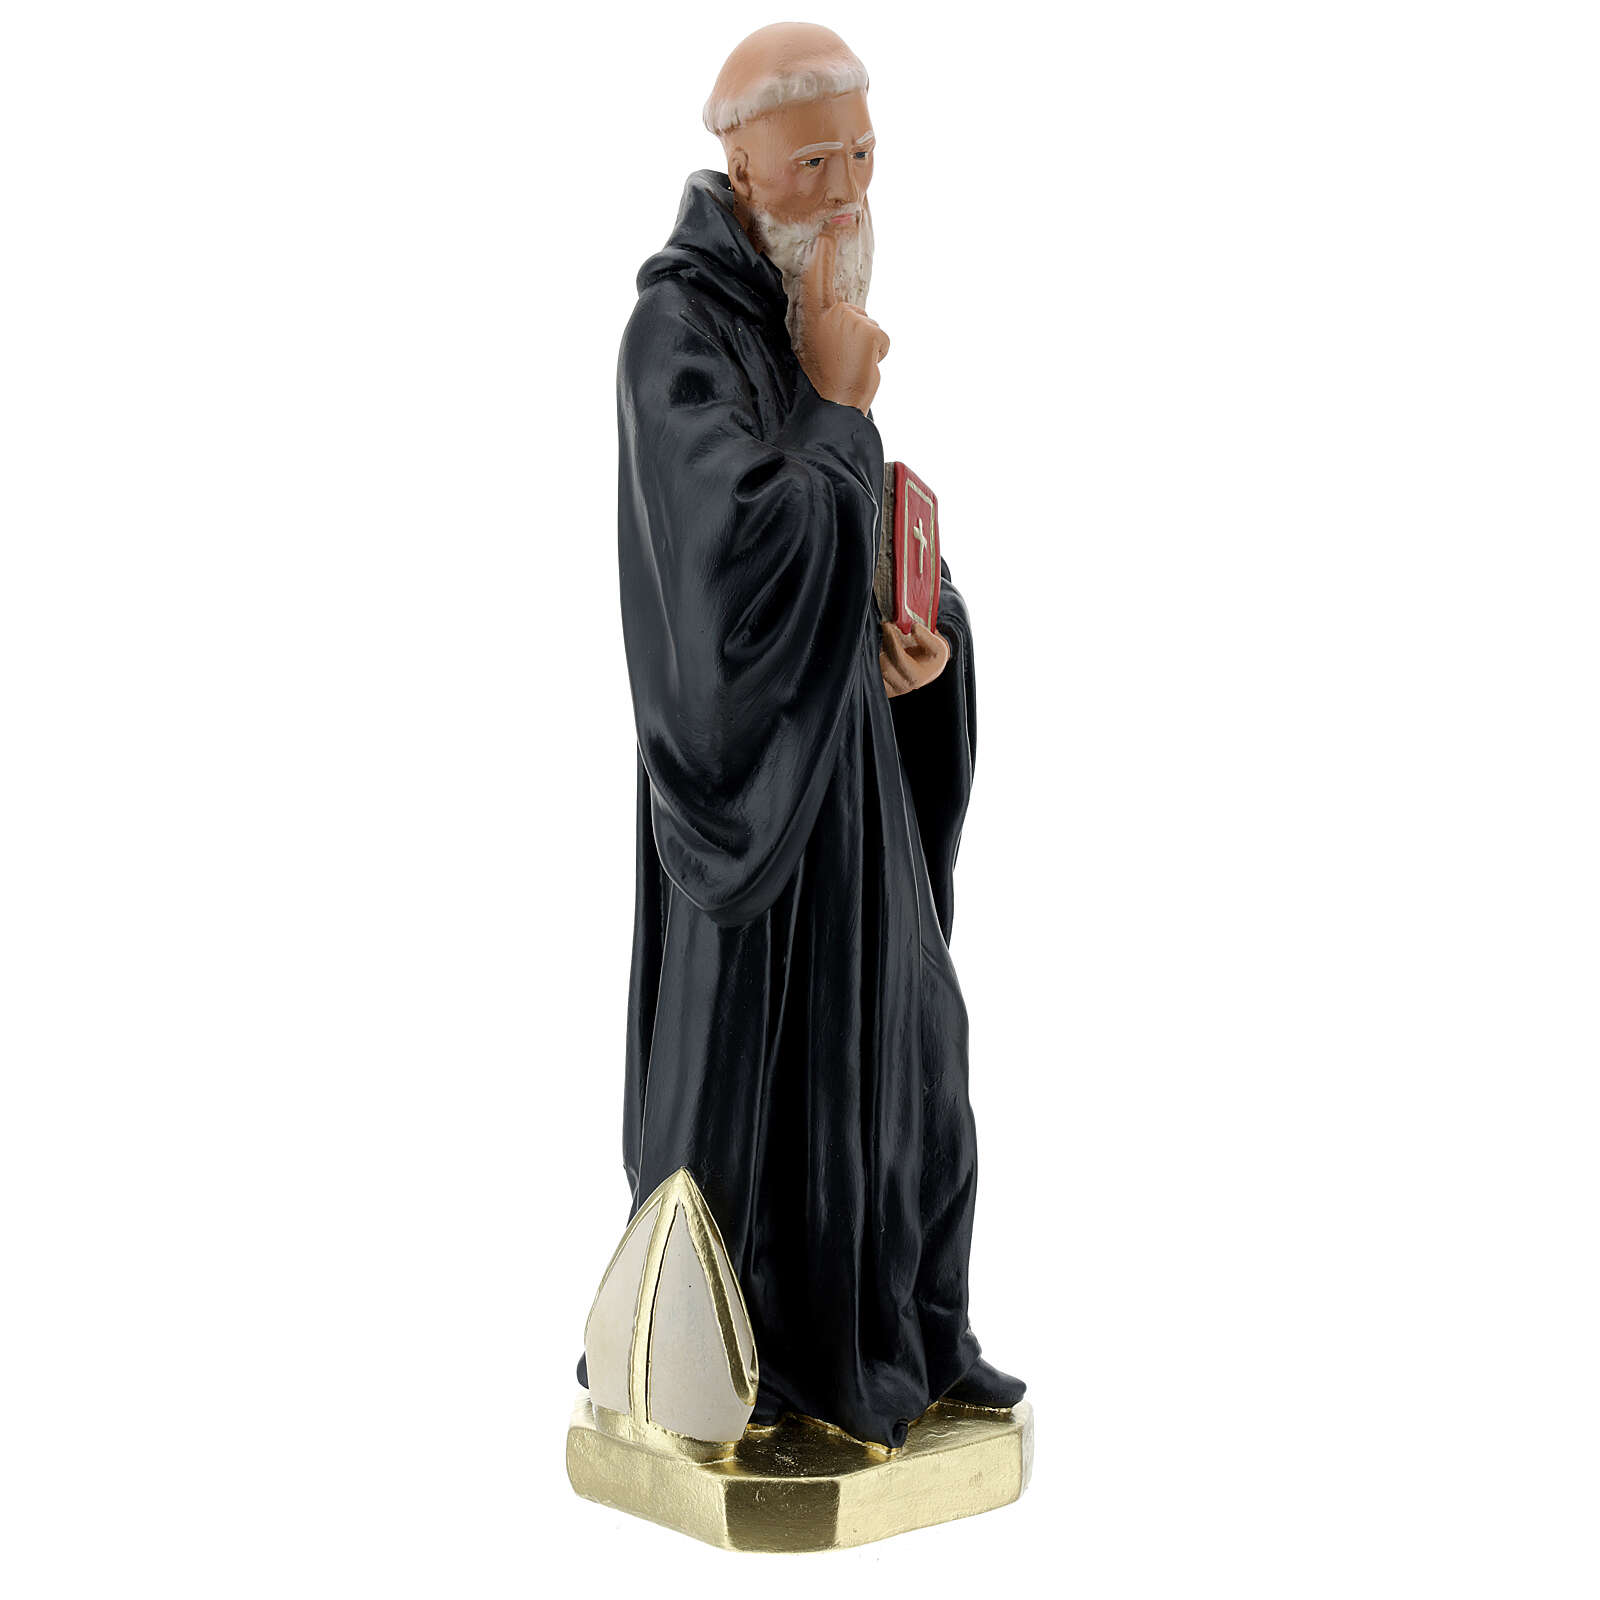 San Benito Abad estatua yeso 40 cm pintada a mano Barsanti 4